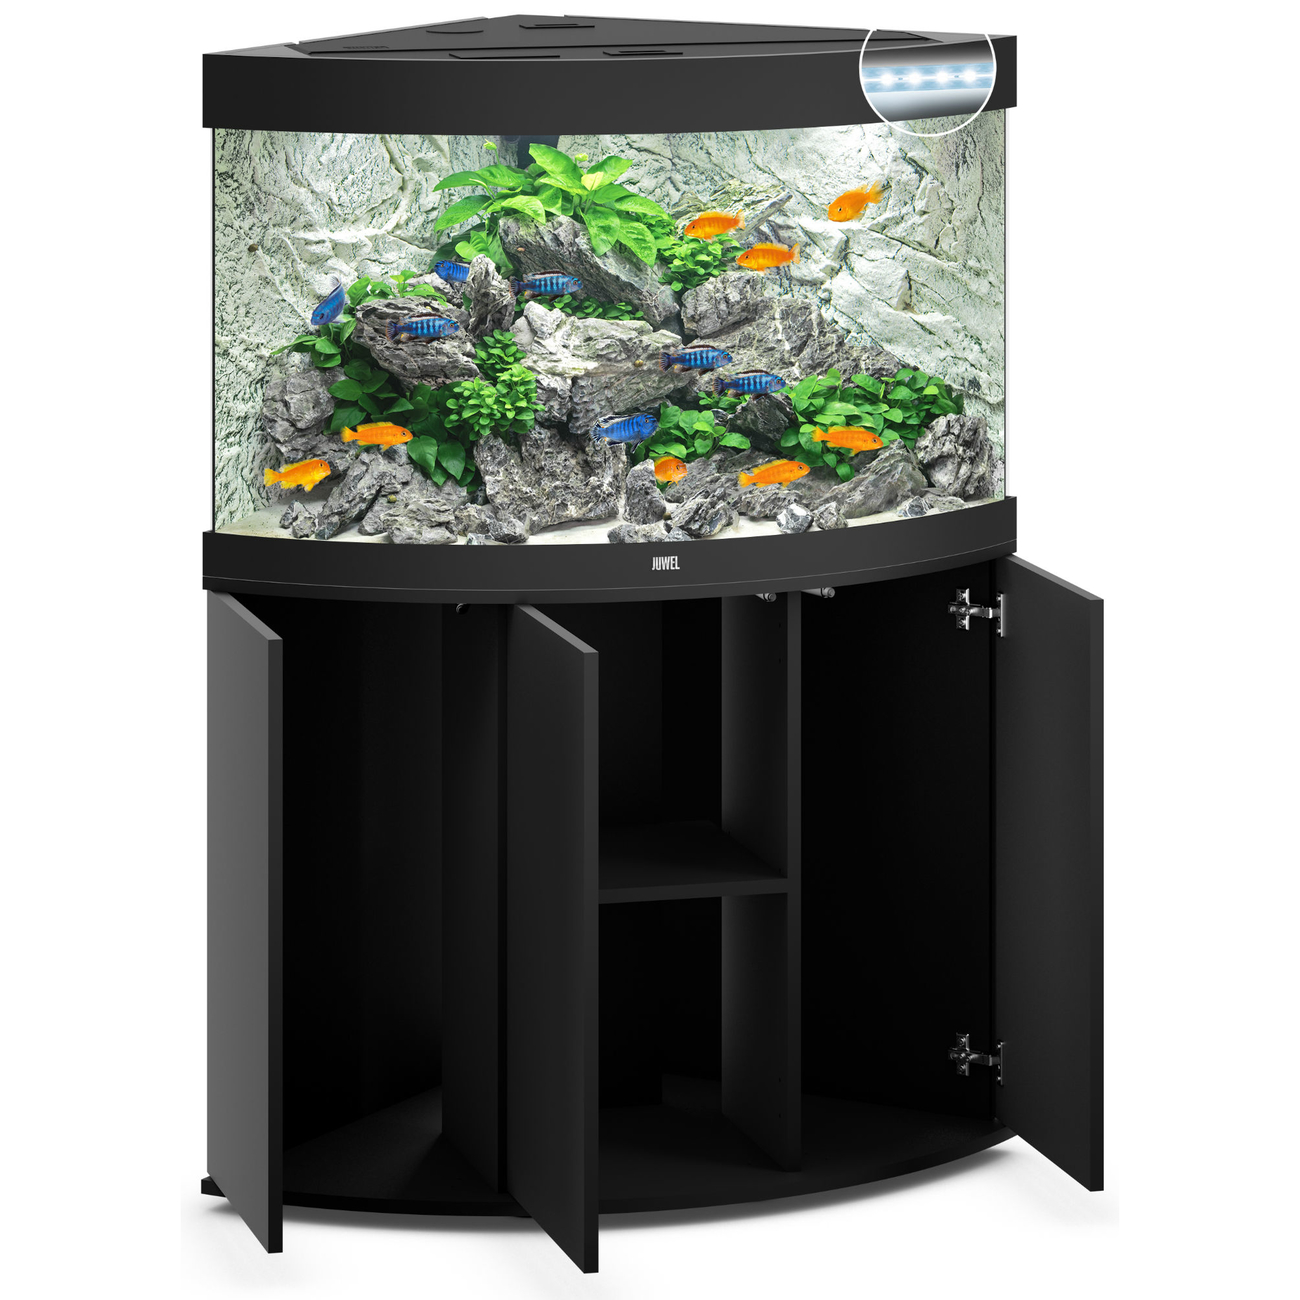 Juwel Trigon 190 LED Eck-Aquarium mit Unterschrank, Bild 2